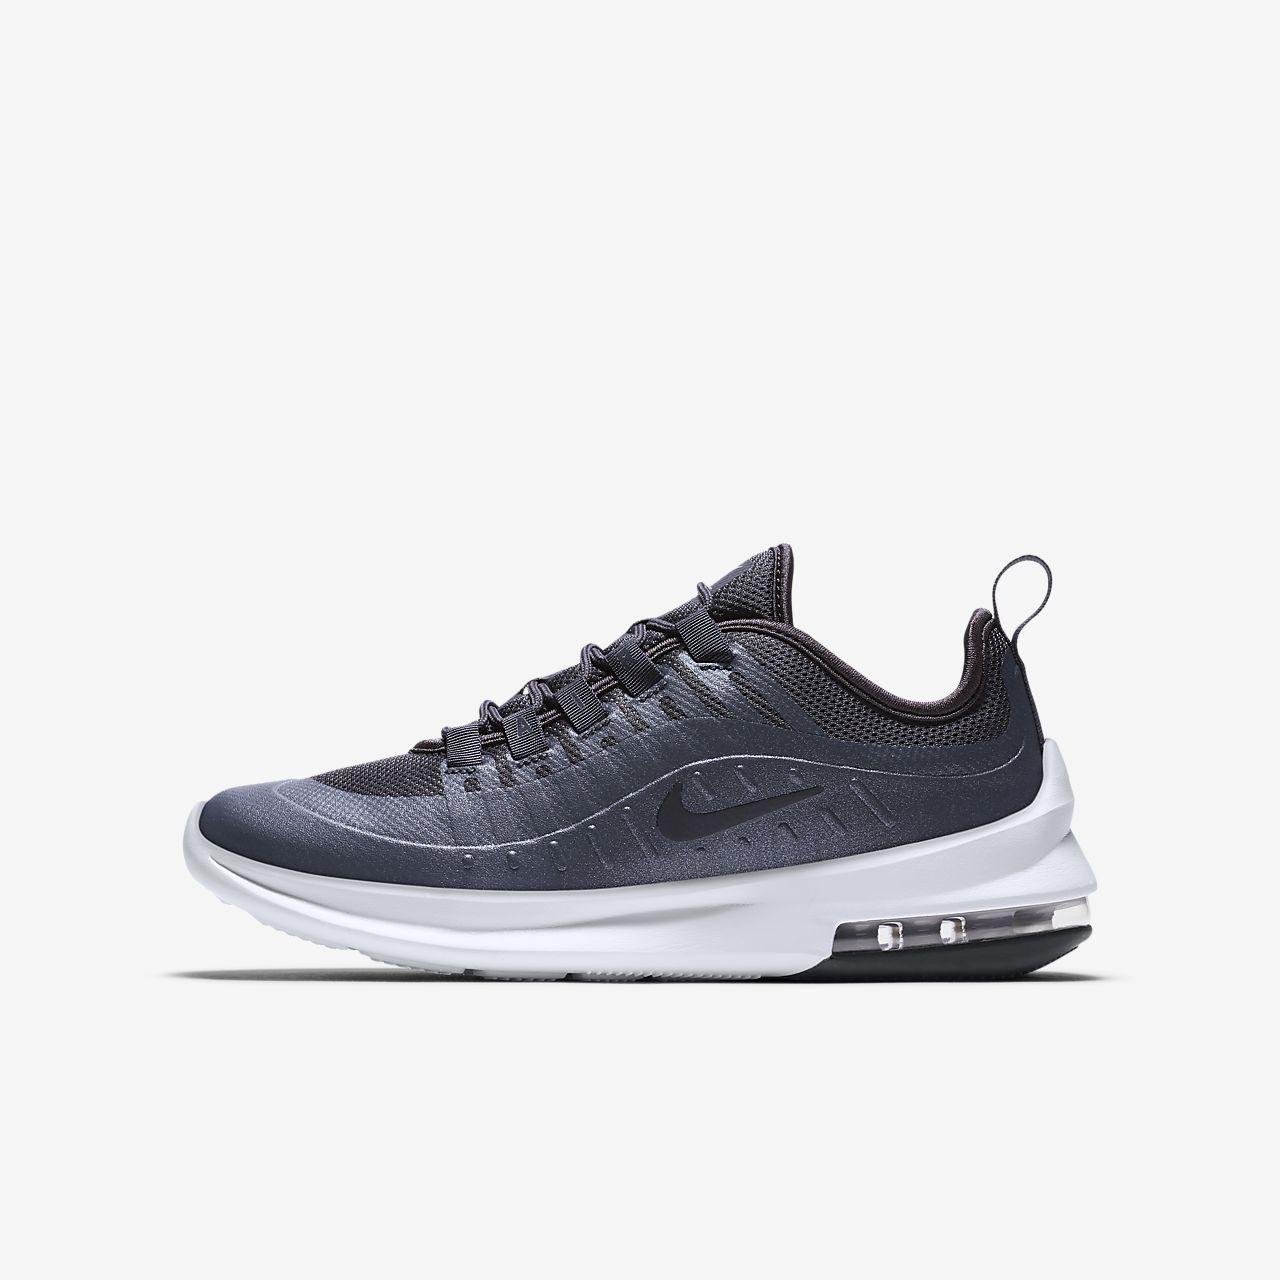 Chaussure Nike Air Max Axis SE pour Homme plus âgé. Nike LU